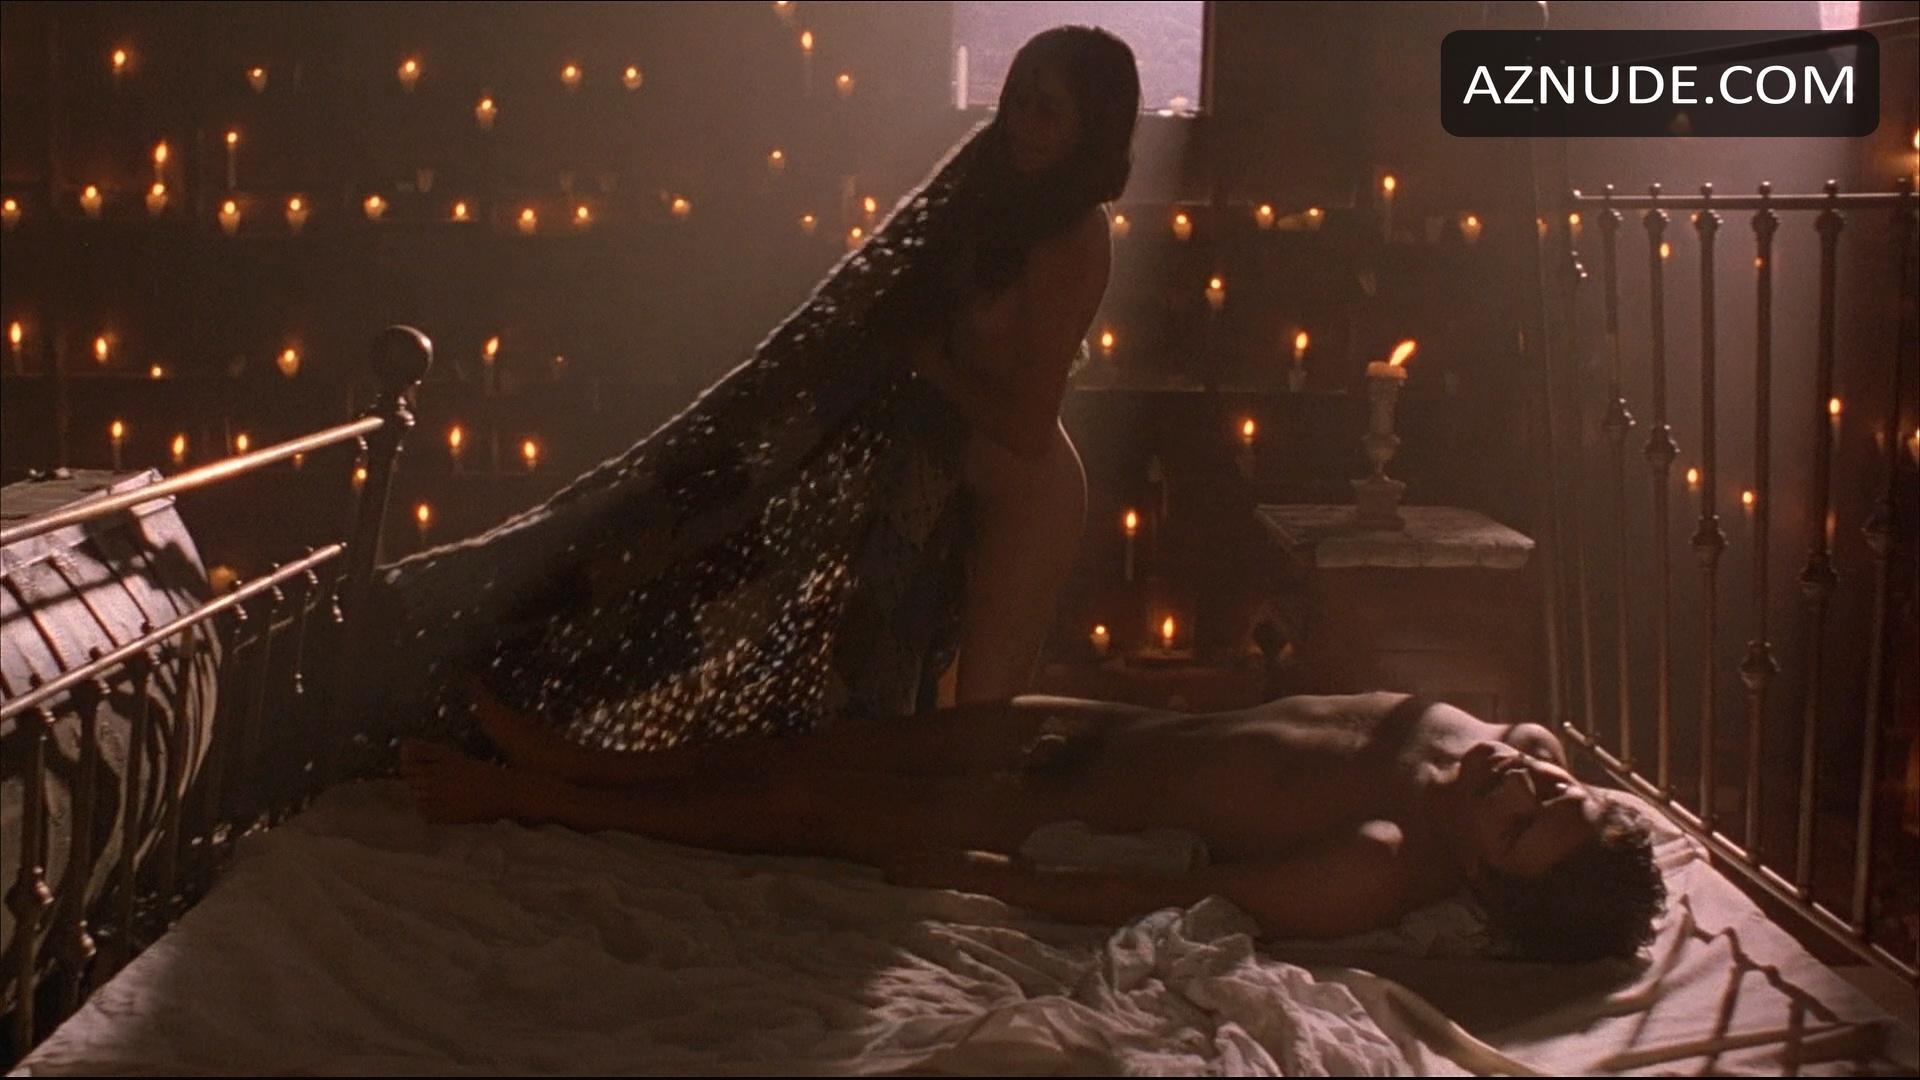 Bachelor night nude scenes heather paige cohn megan albertus - 1 part 1